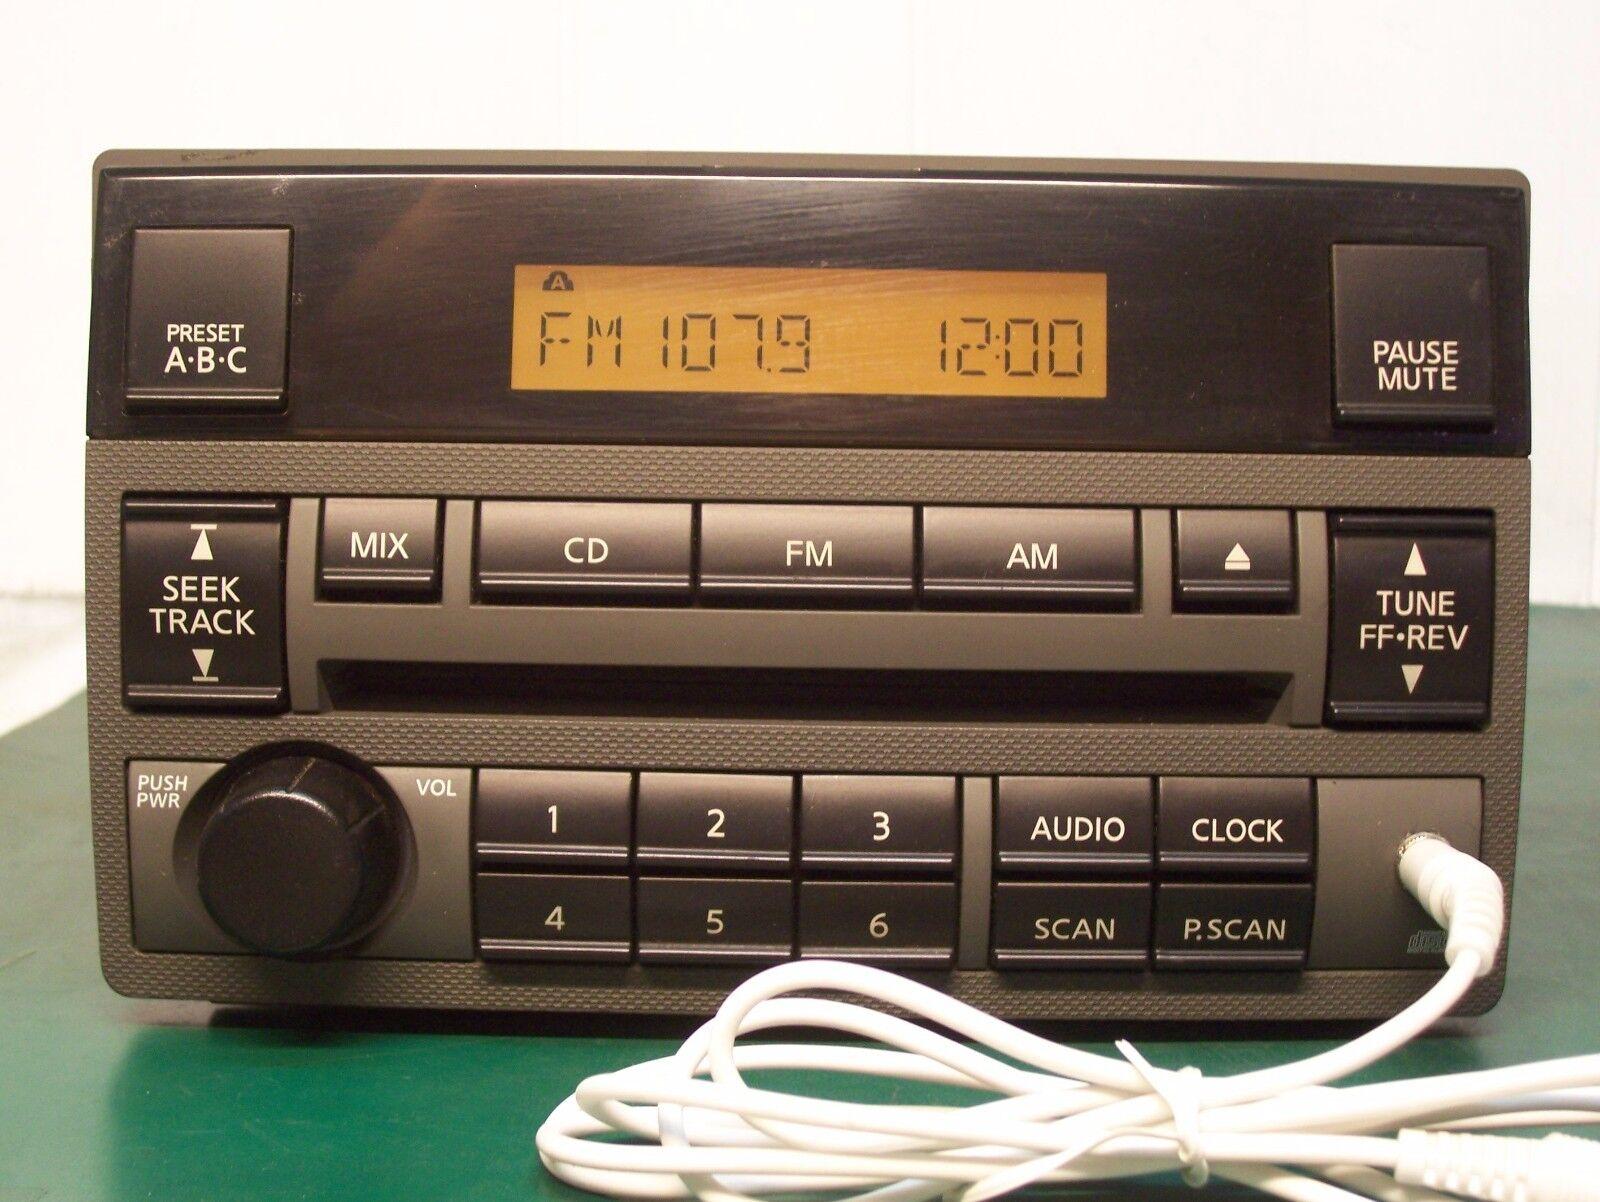 2005-06 NISSAN ALTIMA RADIO CD PLAYER AUX Input 28185-ZB100